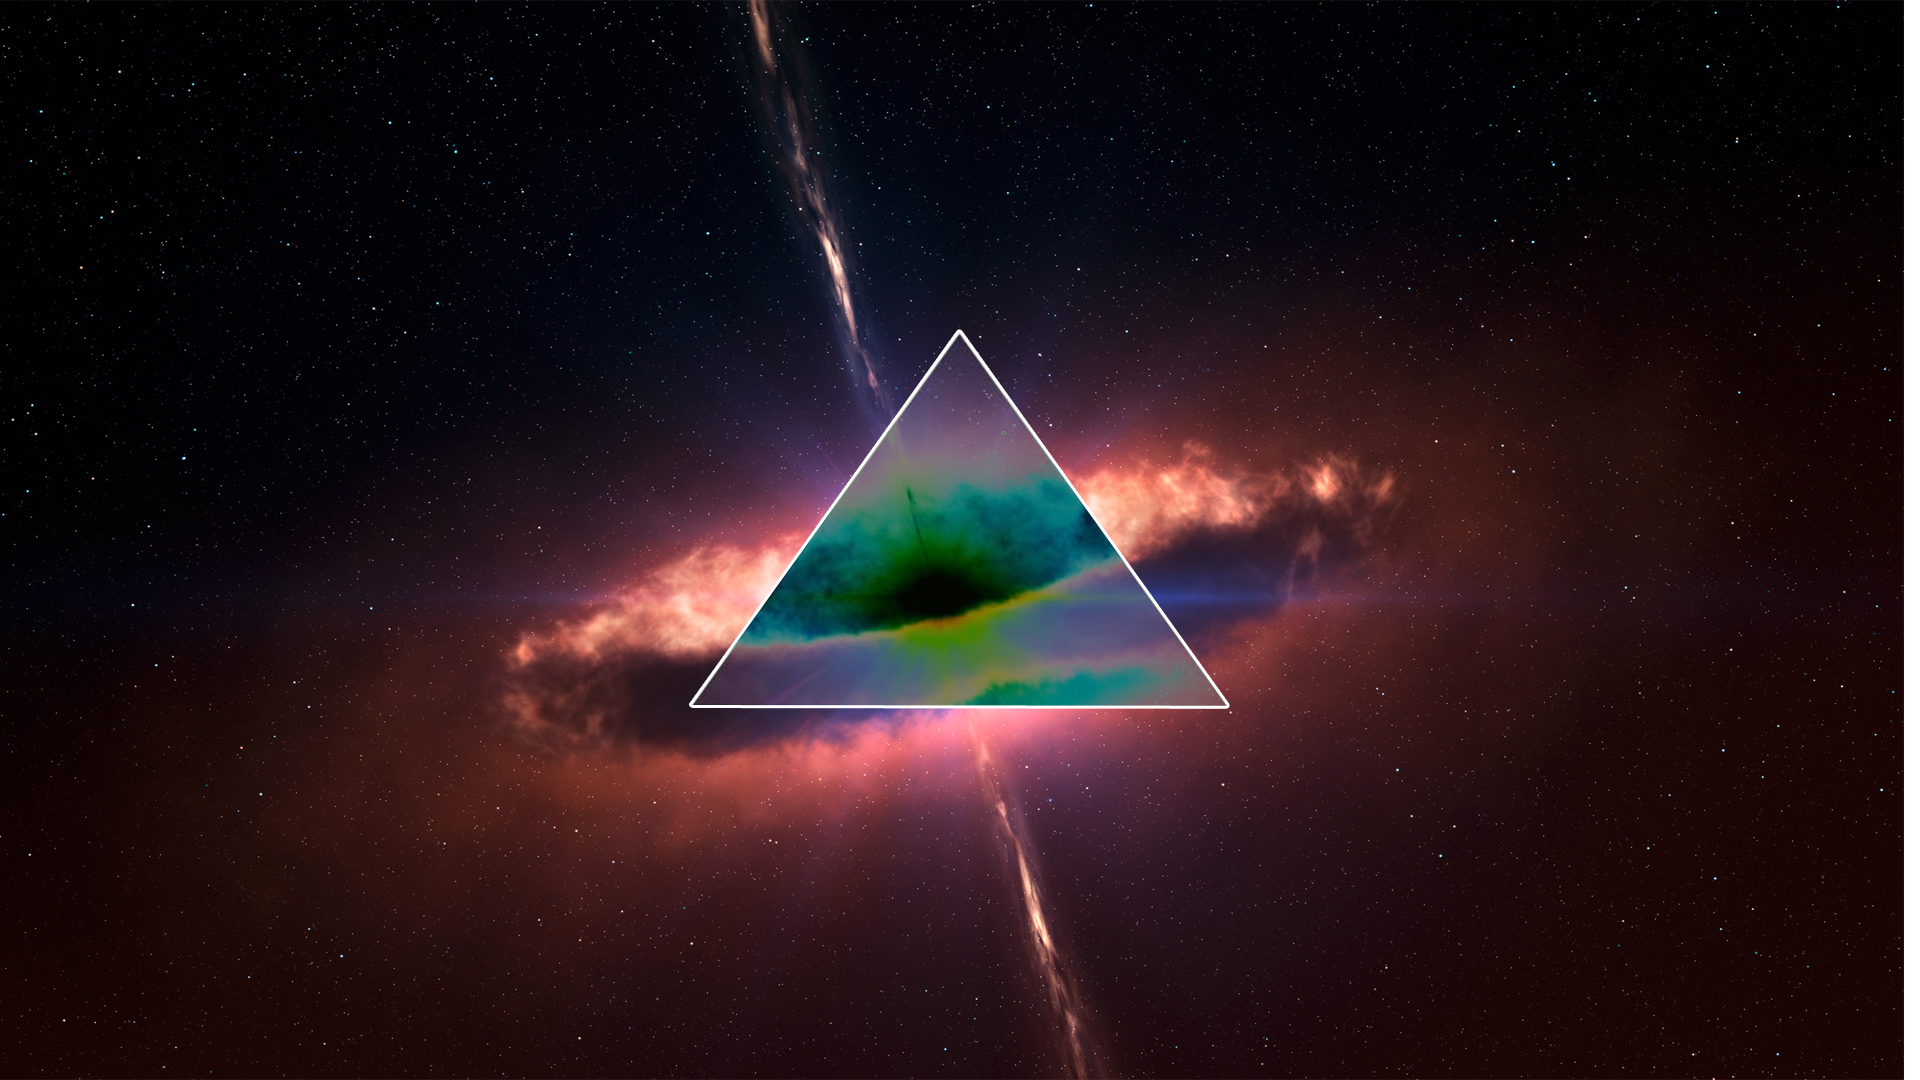 Trippy Space Twitter Backgrounds Trippy triangle by rollsart 1920x1080